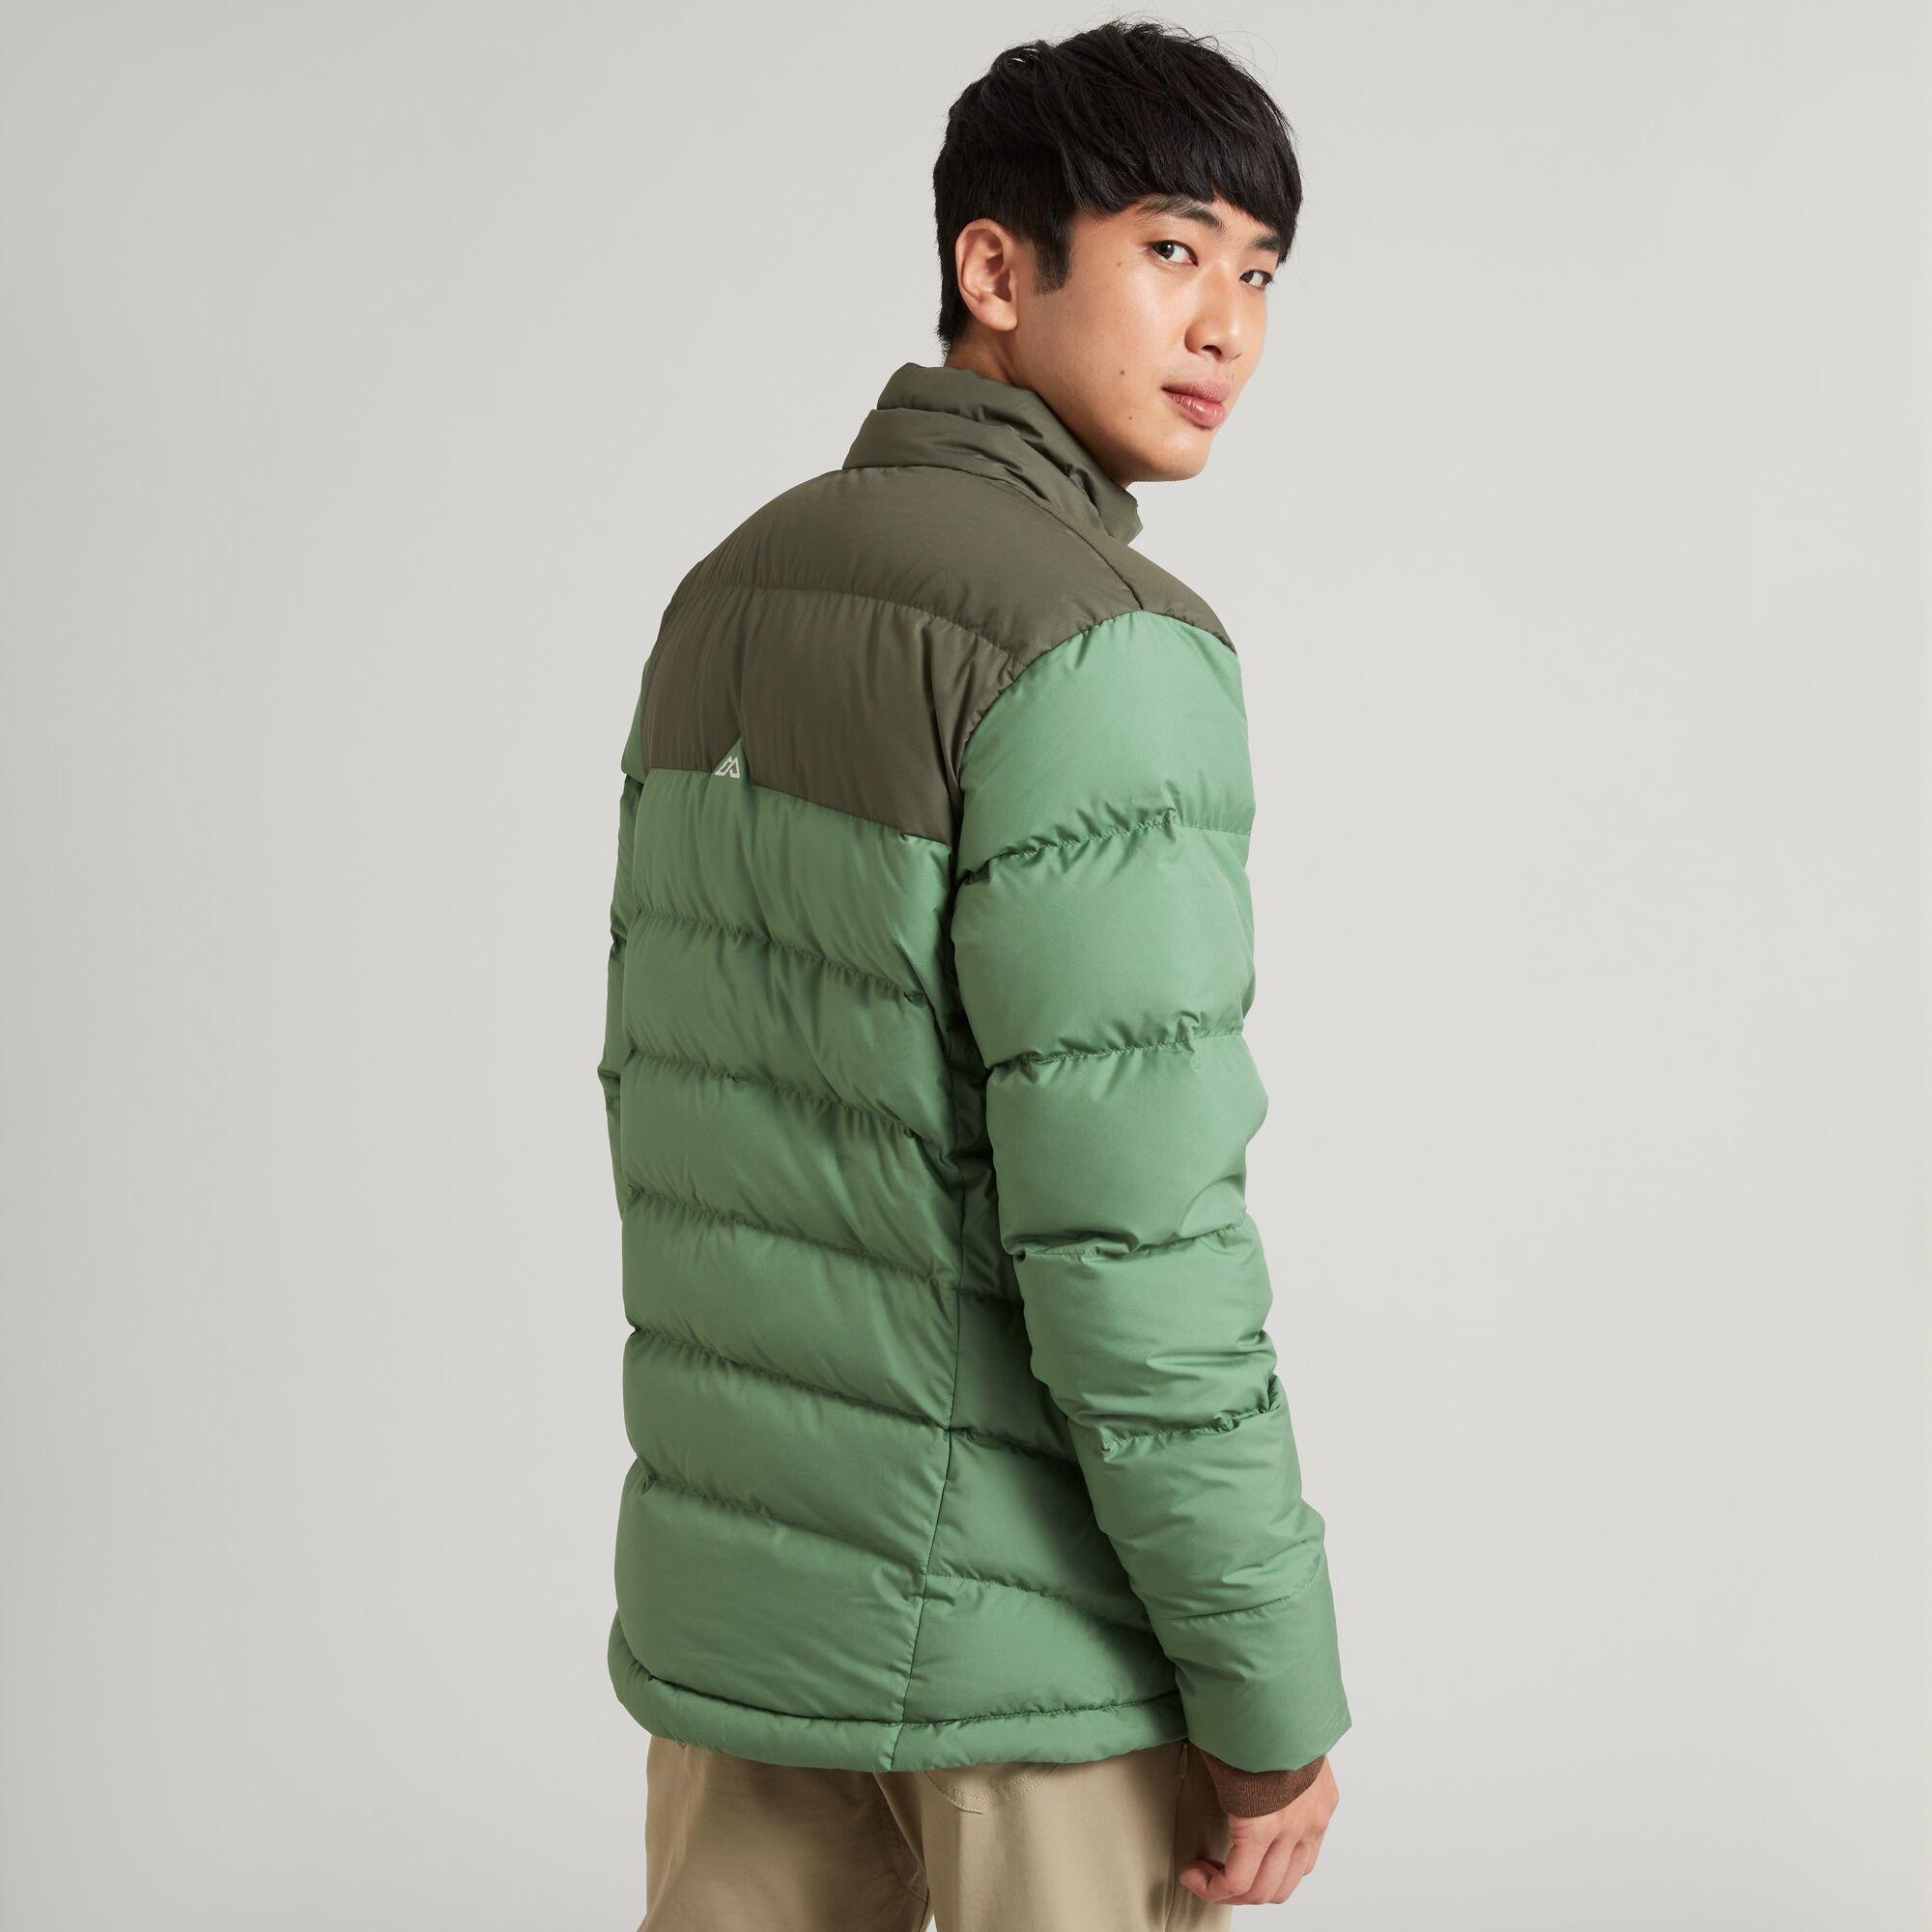 thumbnail 36 - NEW Kathmandu Epiq Mens 600 Fill Down Puffer Warm Outdoor Winter Jacket